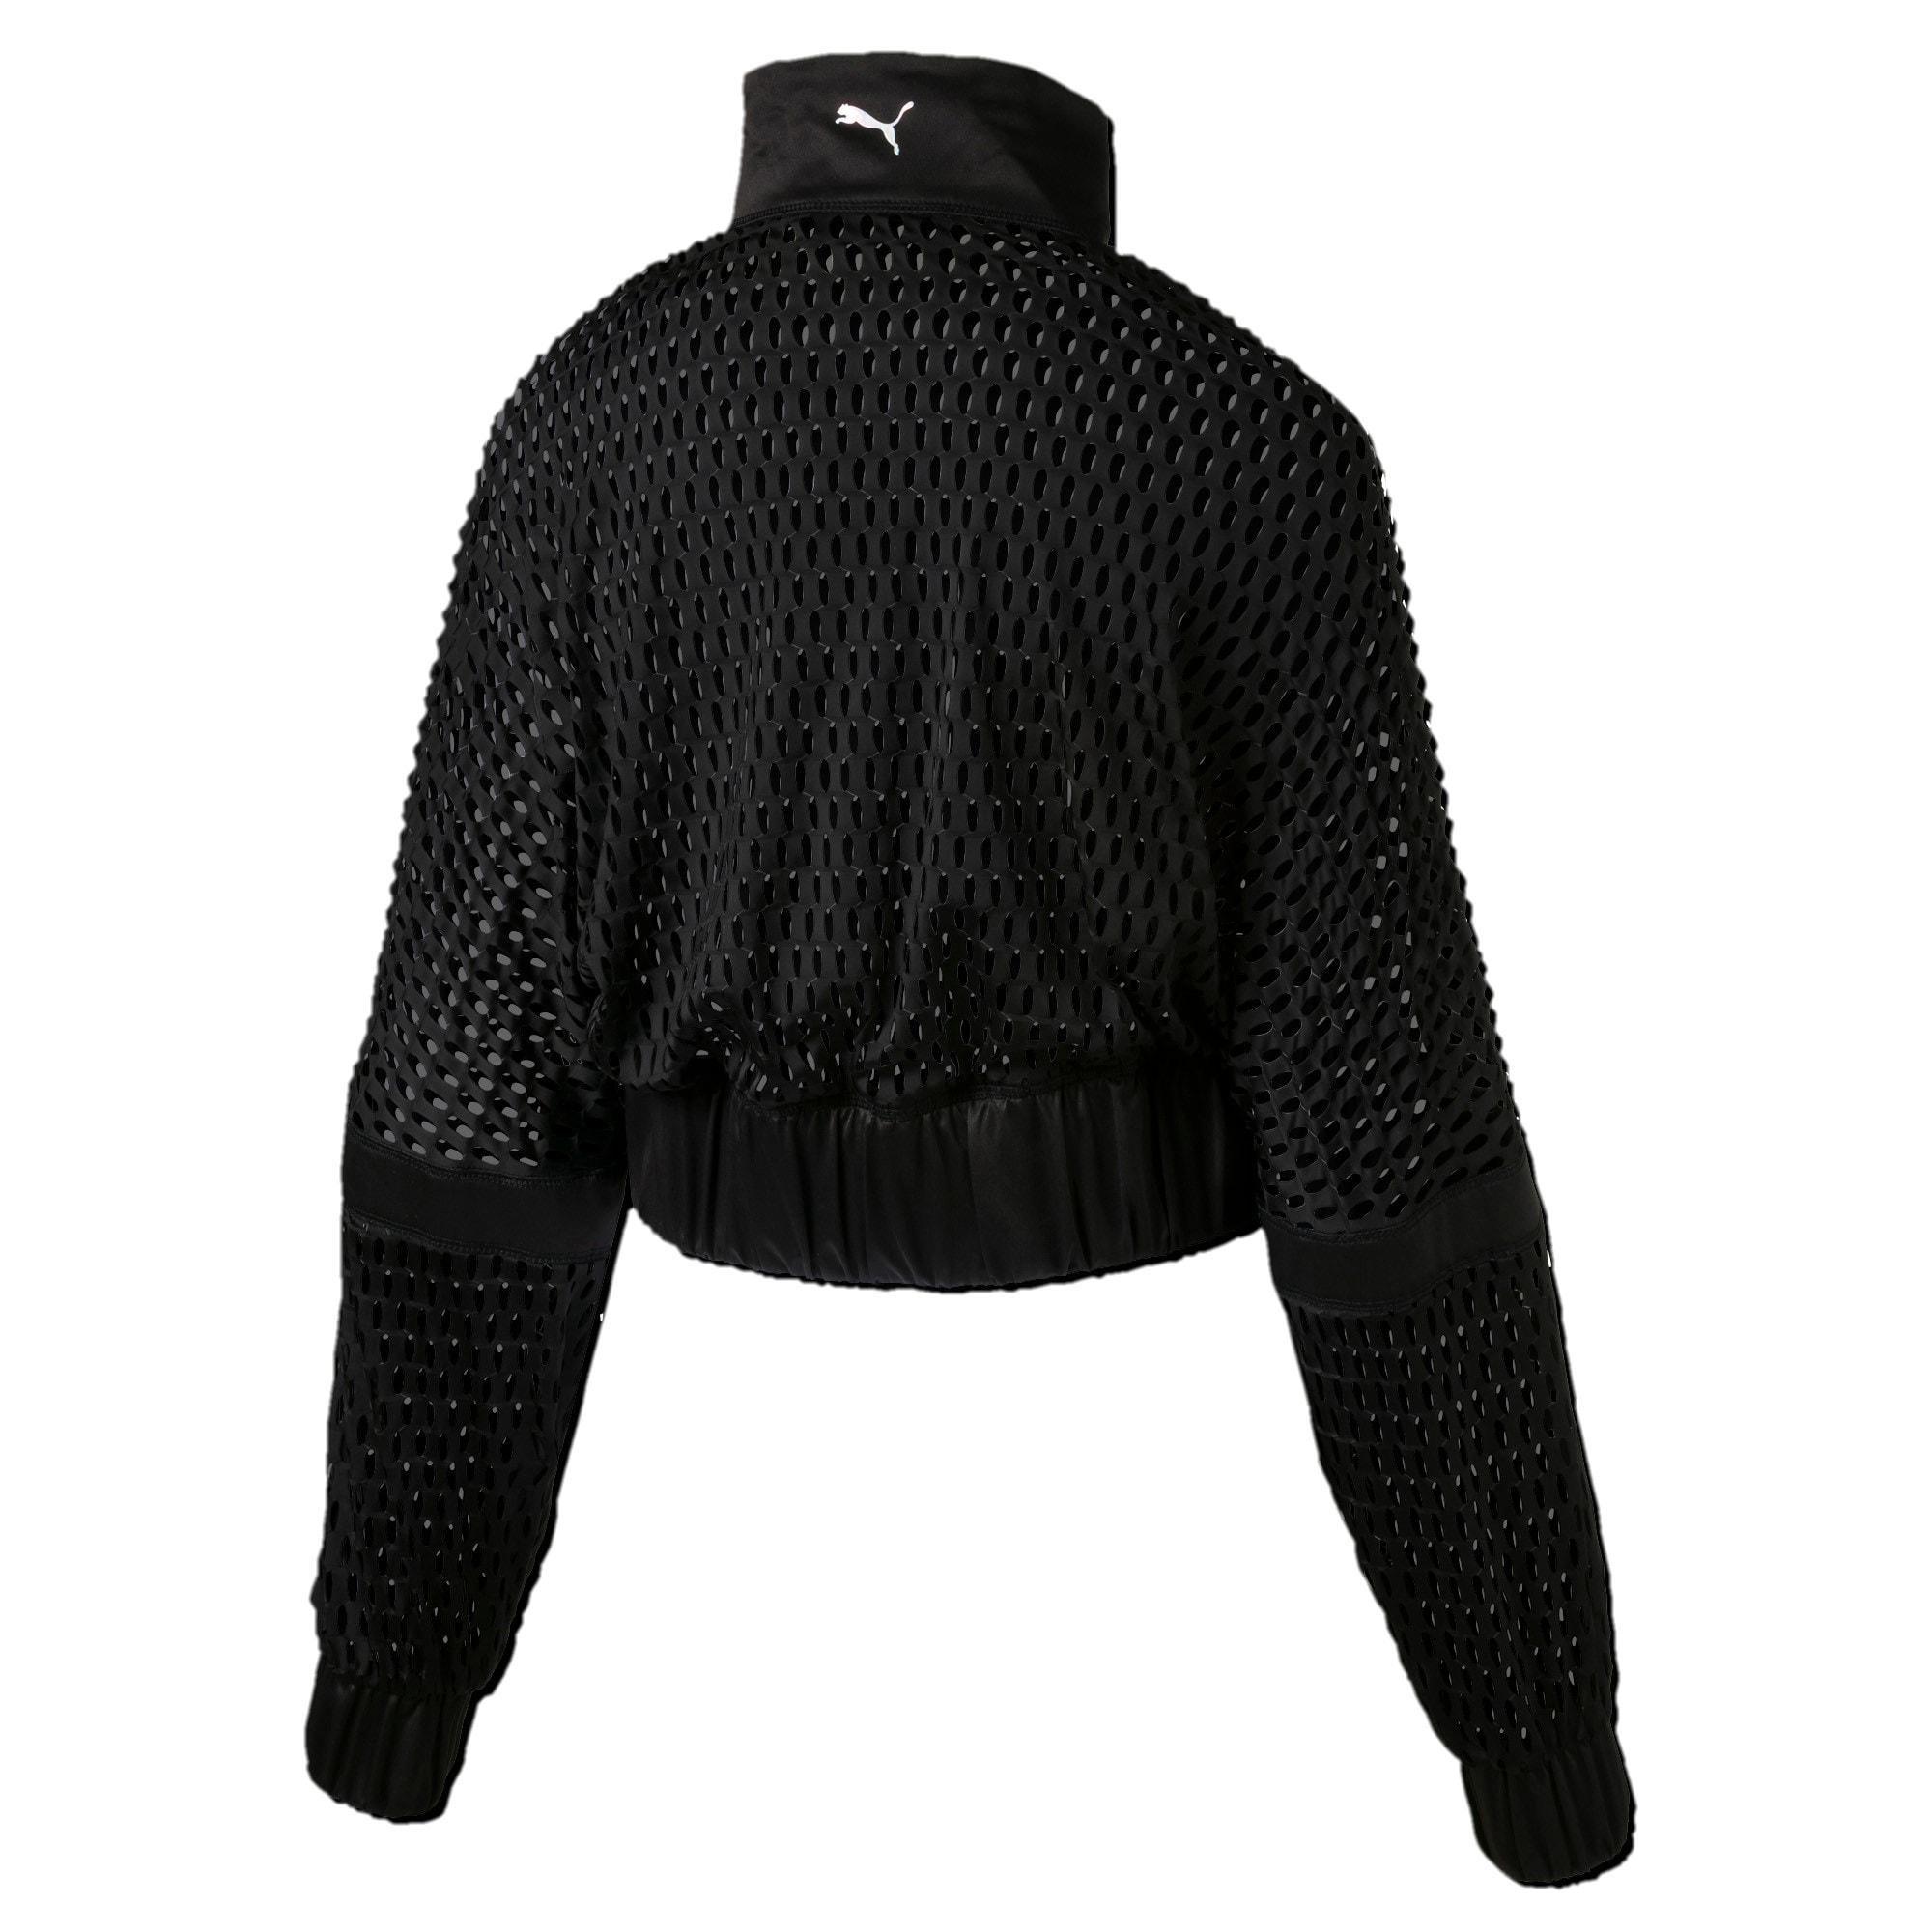 Thumbnail 4 of On the Brink Women's Knit Jacket, Puma Black, medium